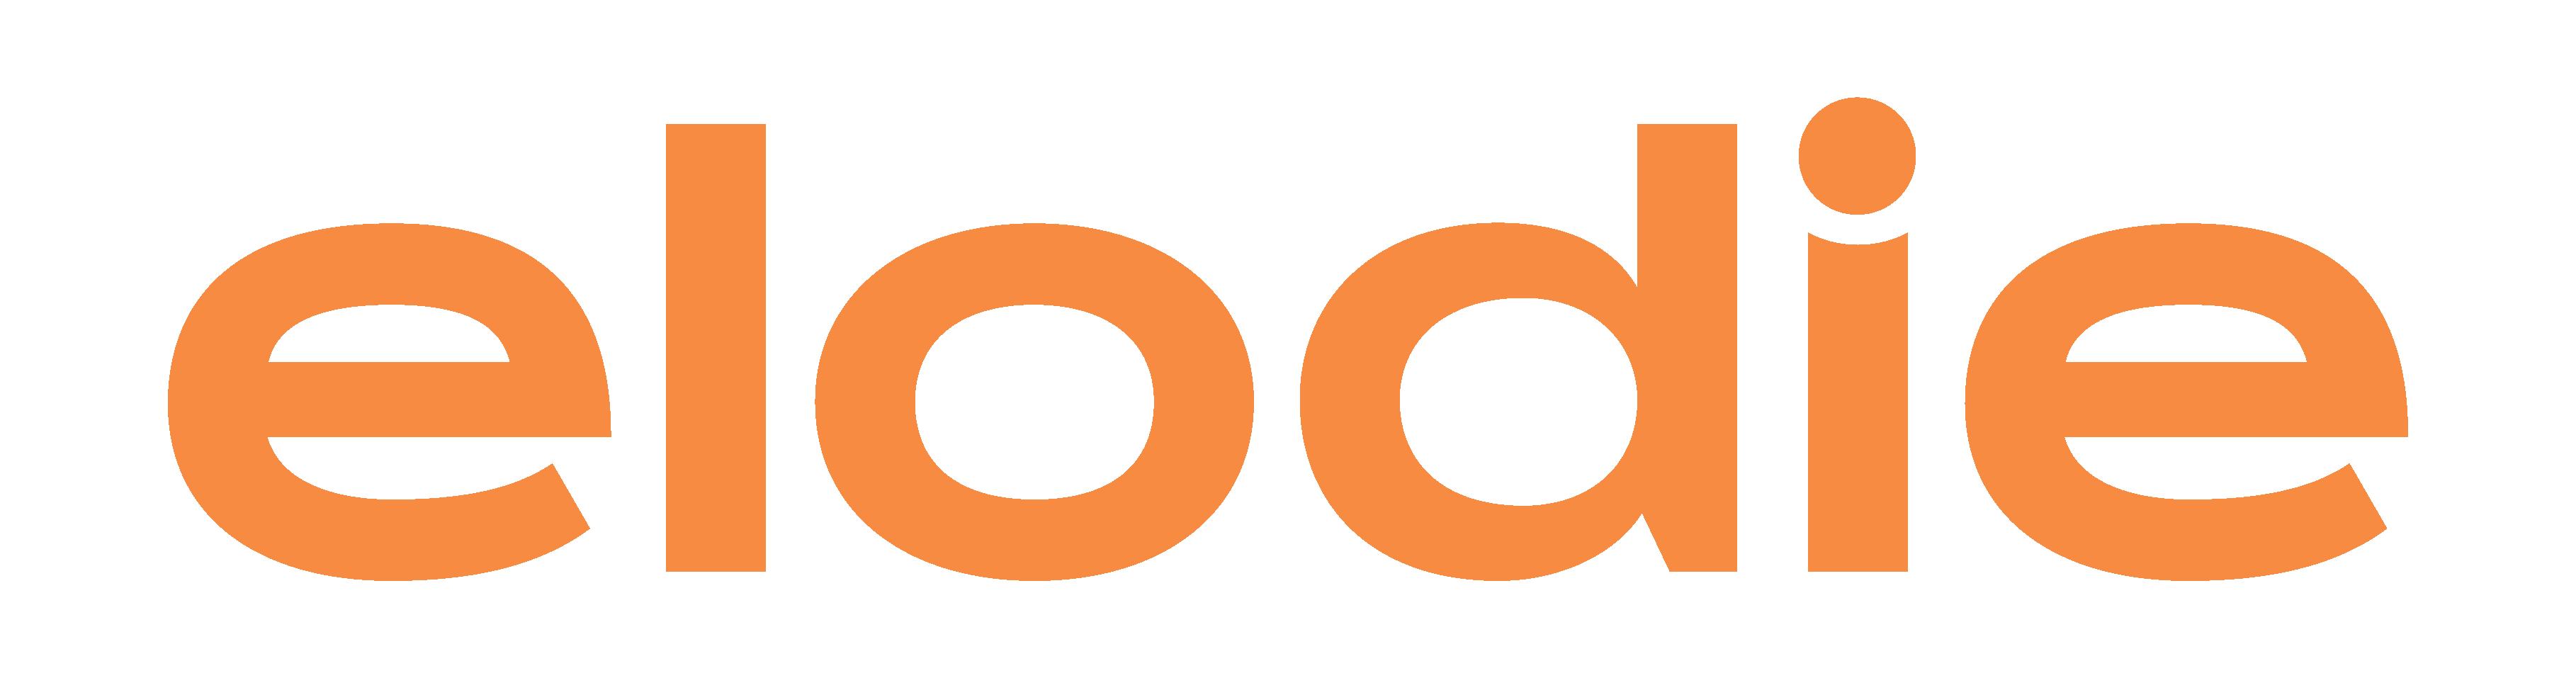 Elodie Games logo